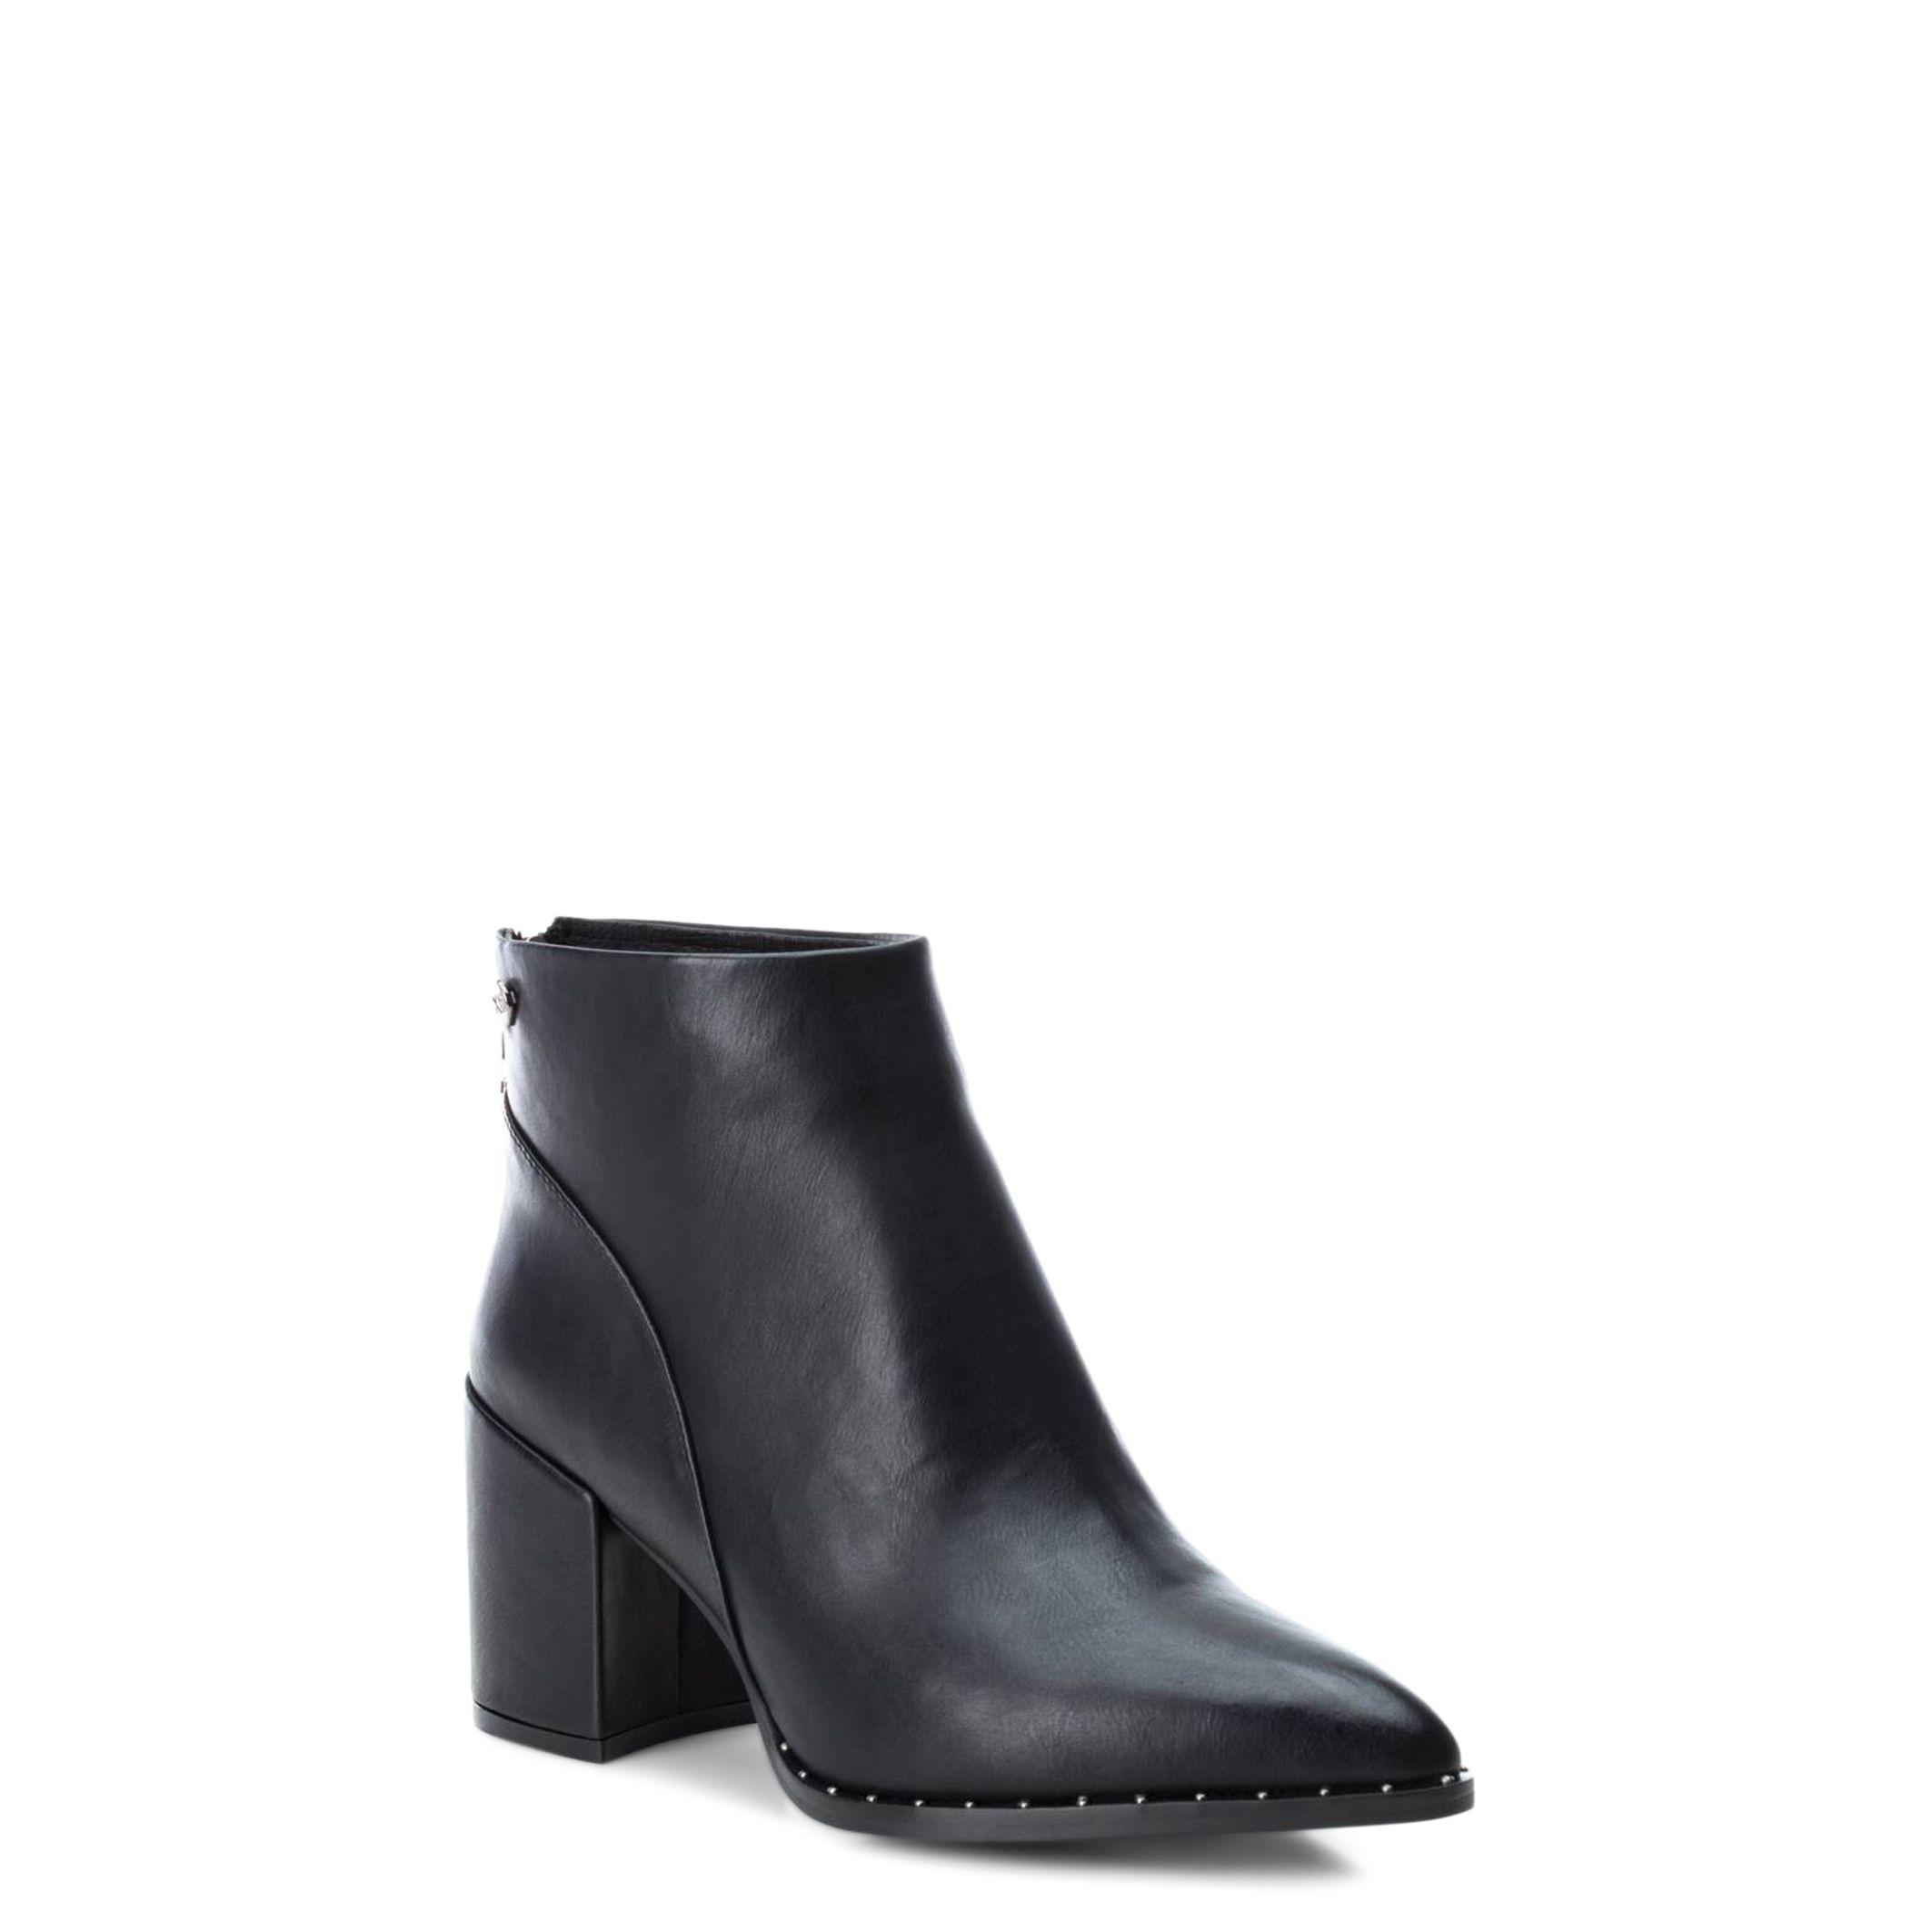 Schuhe Xti – 35117 – Schwarz